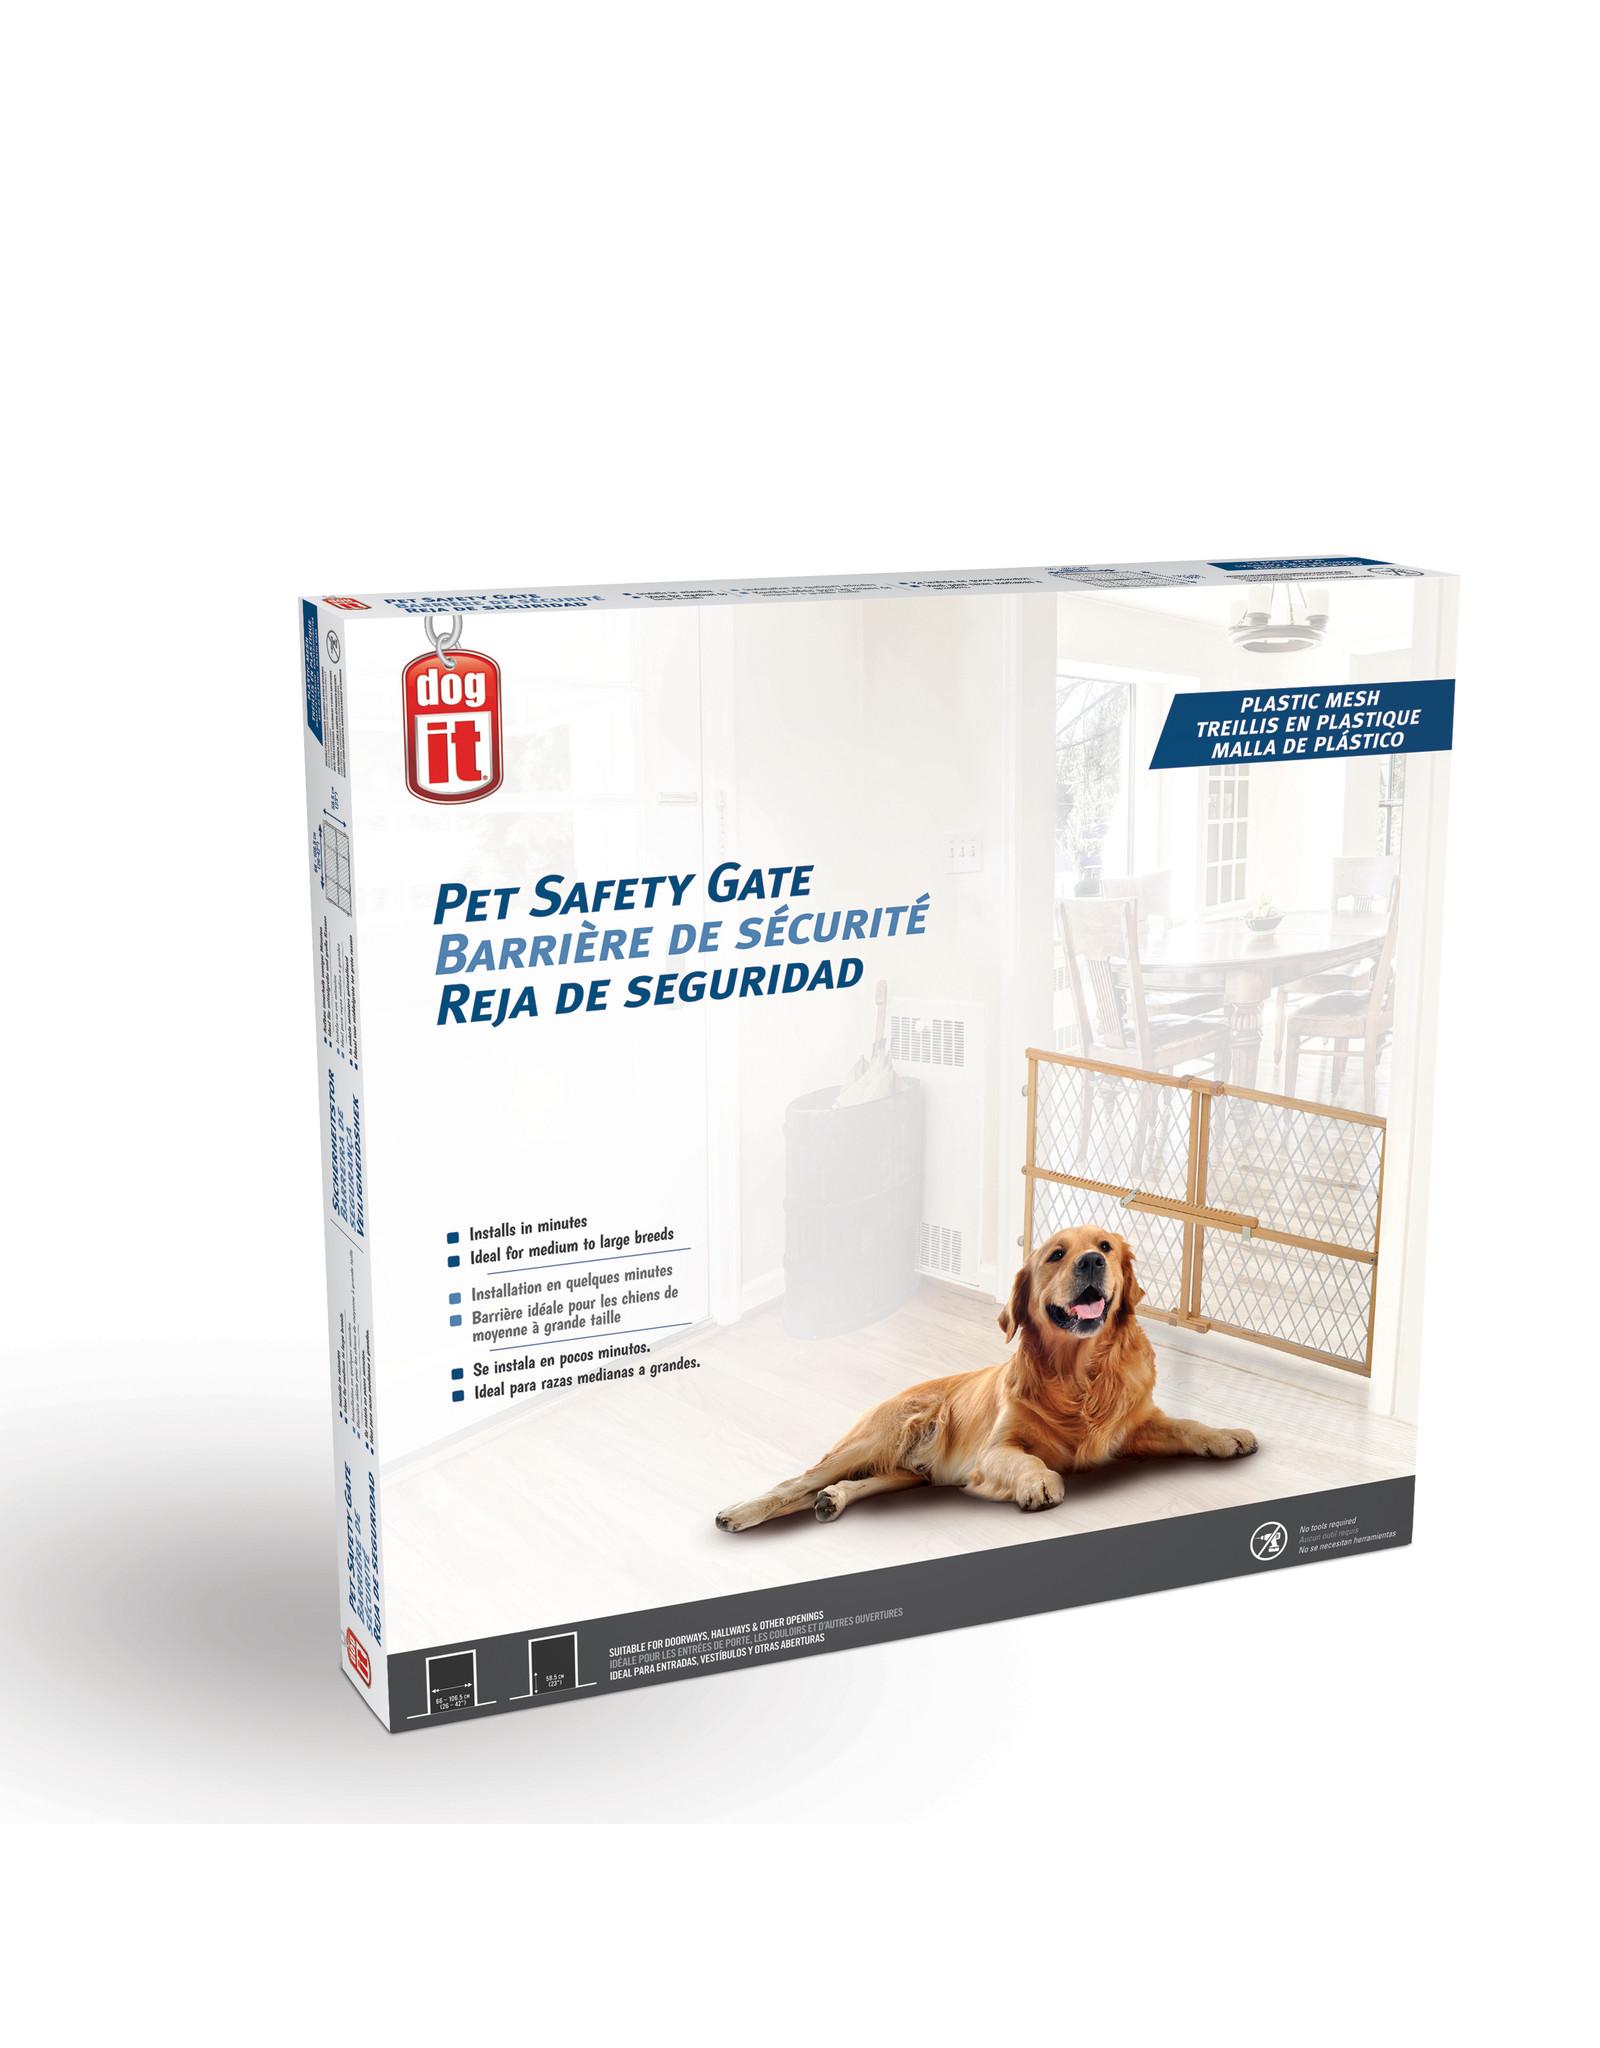 DO - Dogit Dogit Pet Safety Gate - Plastic Mesh - 66 cm - 106.5 cm W x 58.5 cm H (26in - 42in W x 23in H)